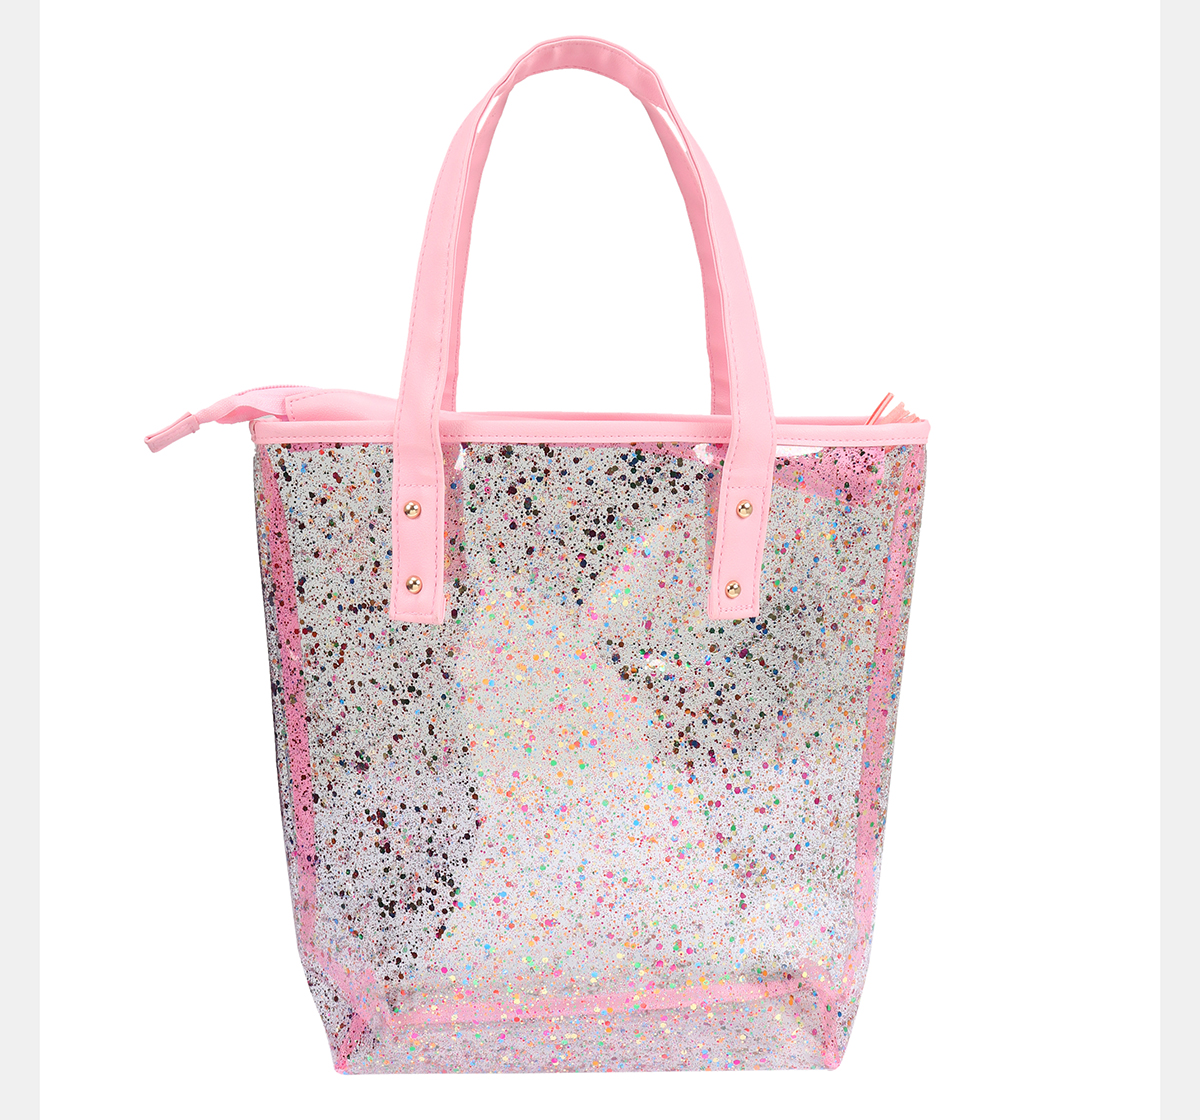 Hamster London | Hamster London Glitter Tote Bag Pink, 6Y+